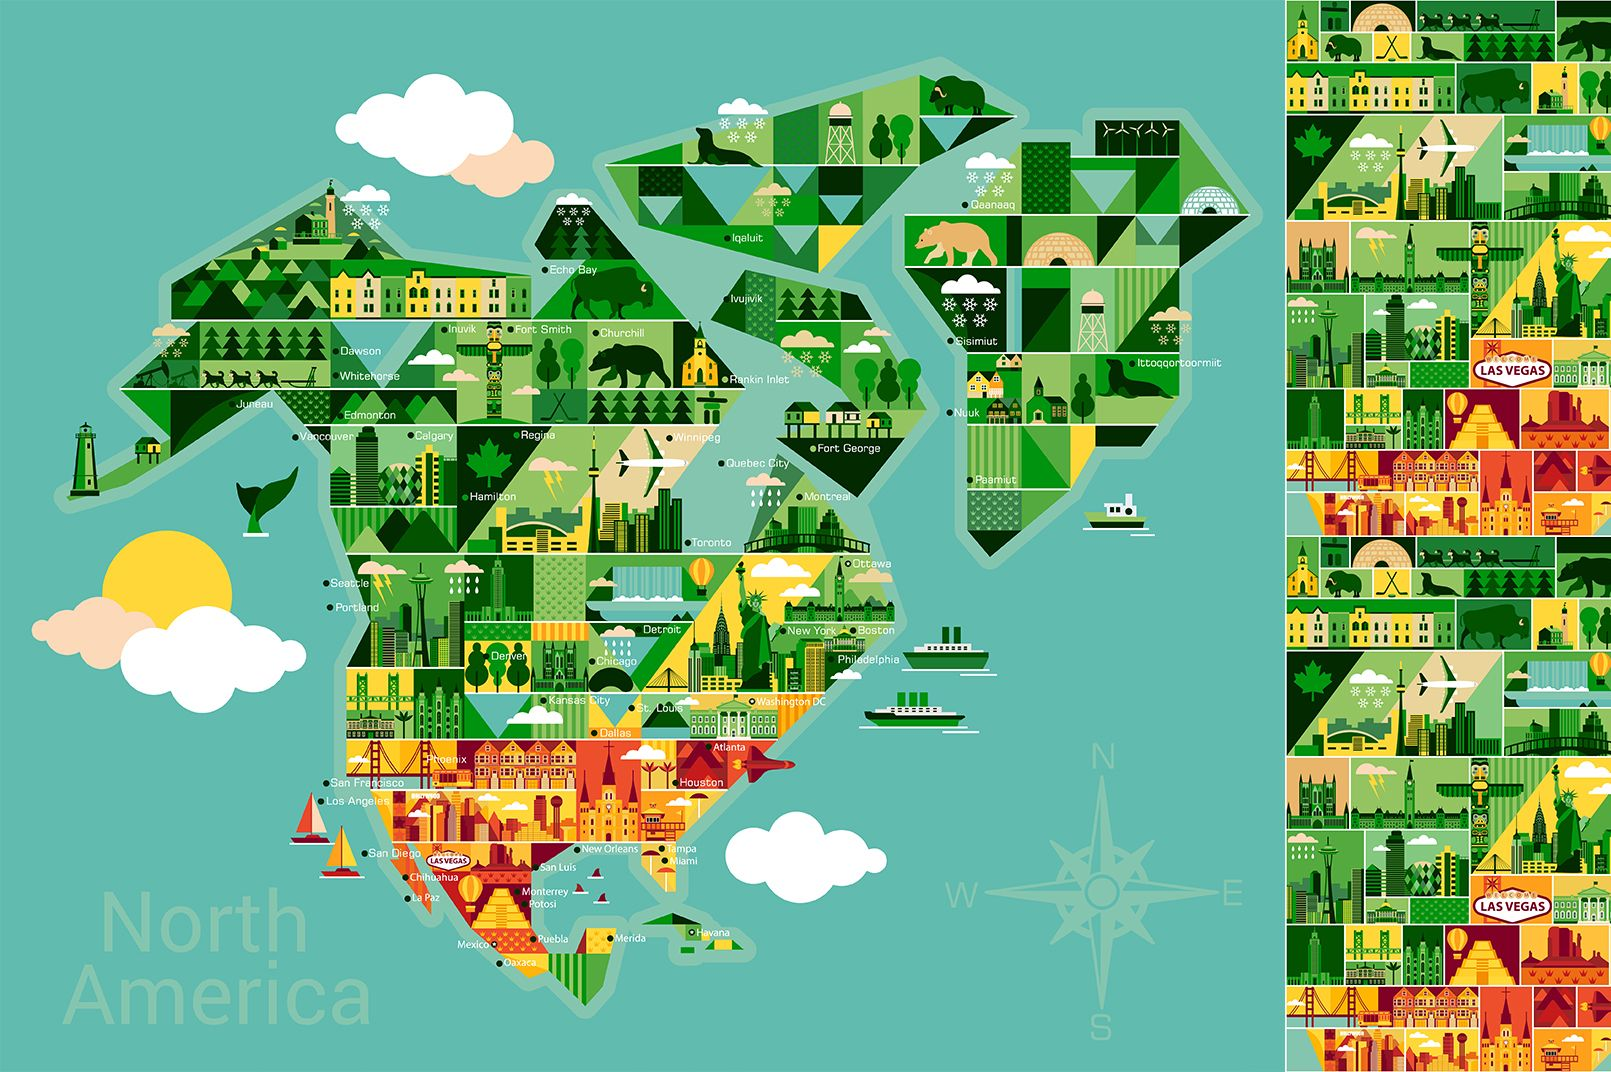 Cartoon map of North America by Moloko88 on @creativemarket